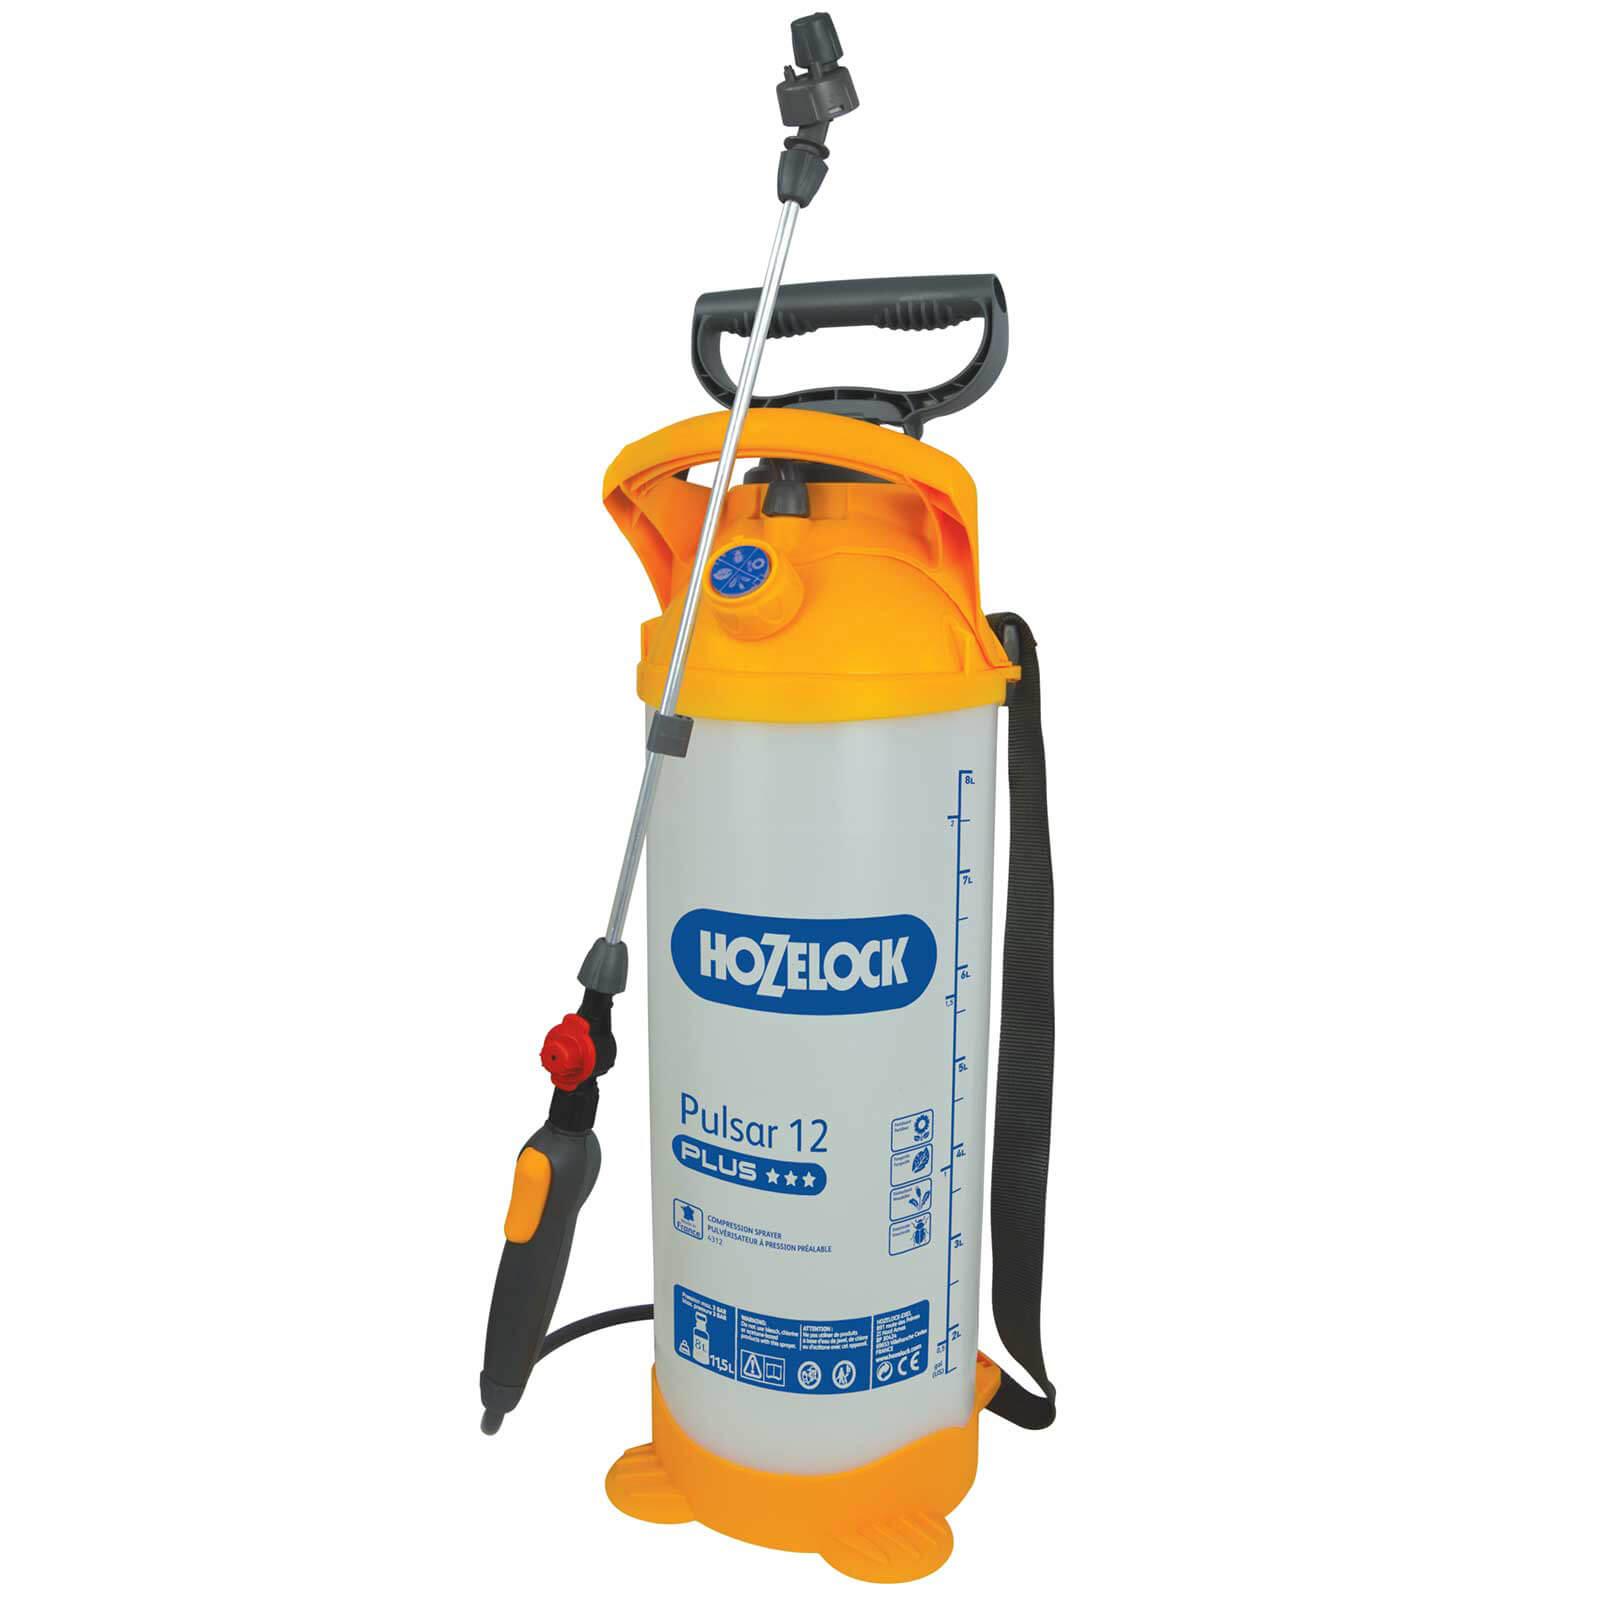 Hozelock PULSAR PLUS Water Pressure Sprayer 12l